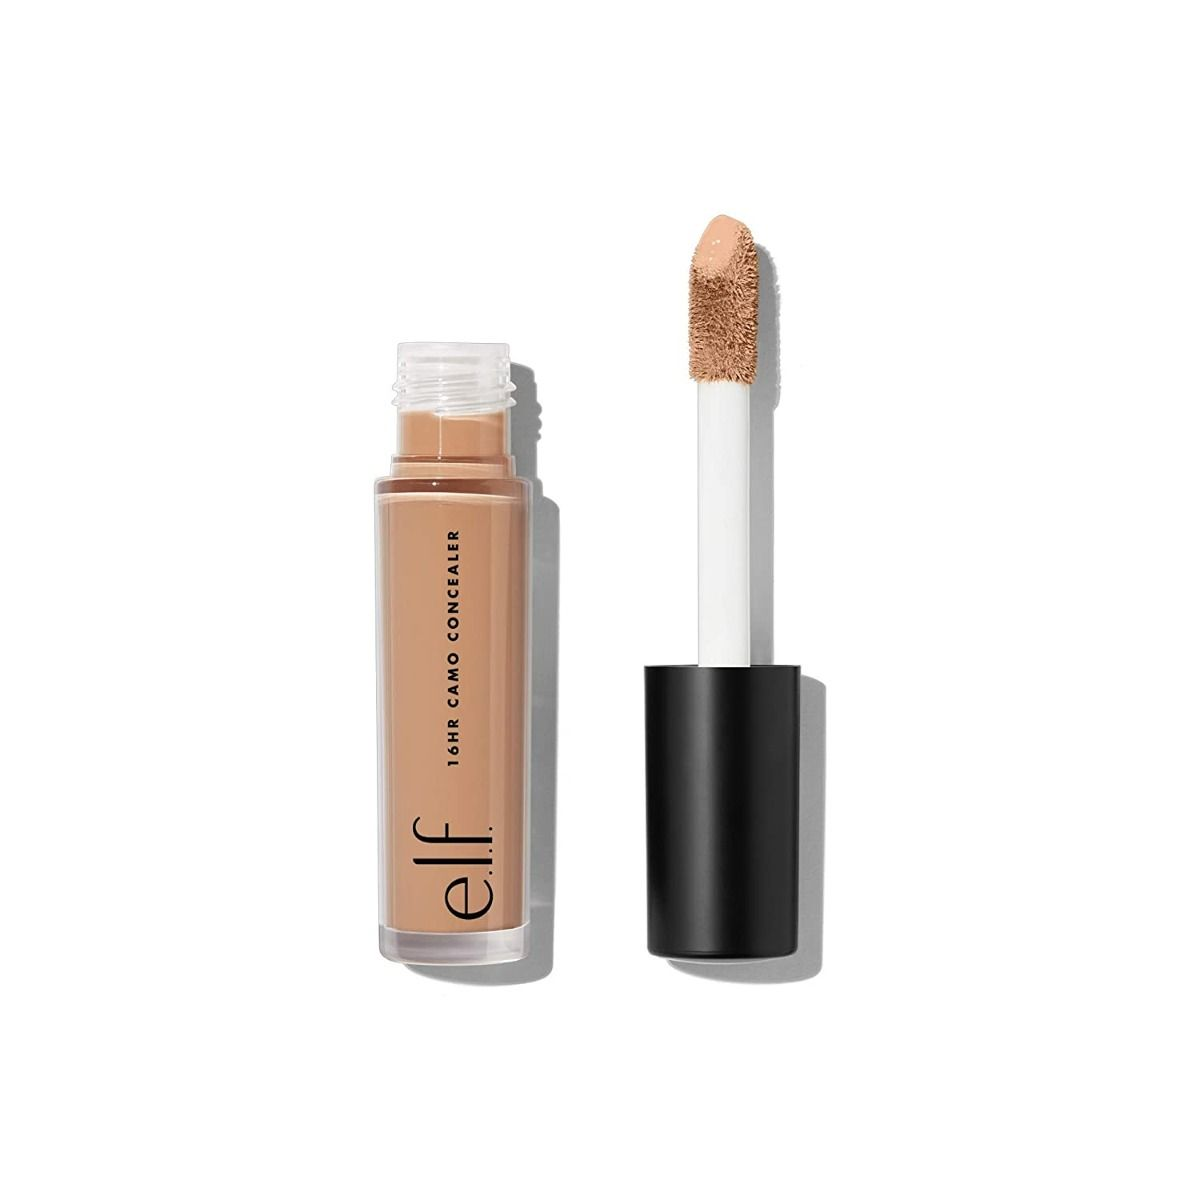 e.l.f. Cosmetics 16HR Camo Concealer Tan Walnut 6ml